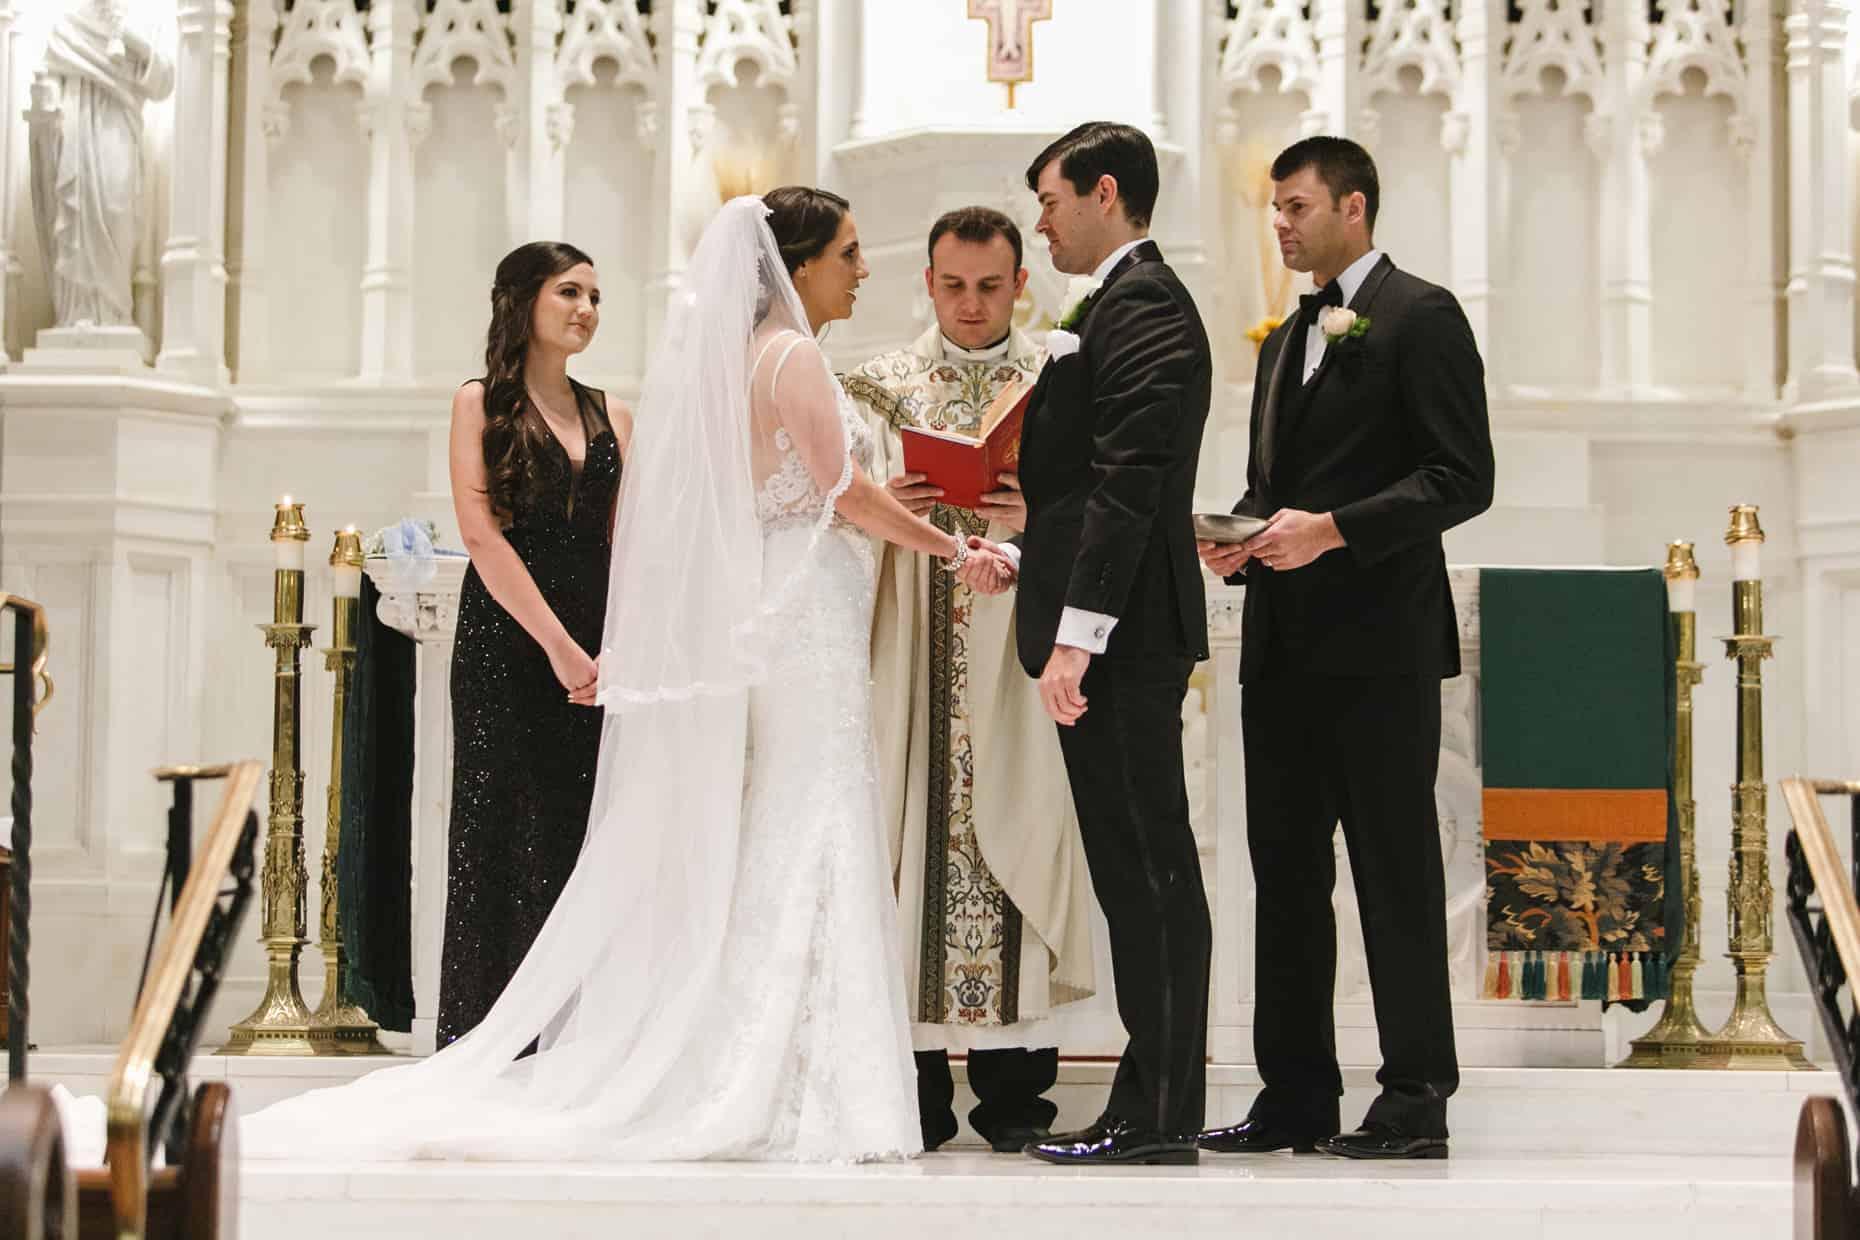 Wedding Photos St. John The Evangelist Philadelphia